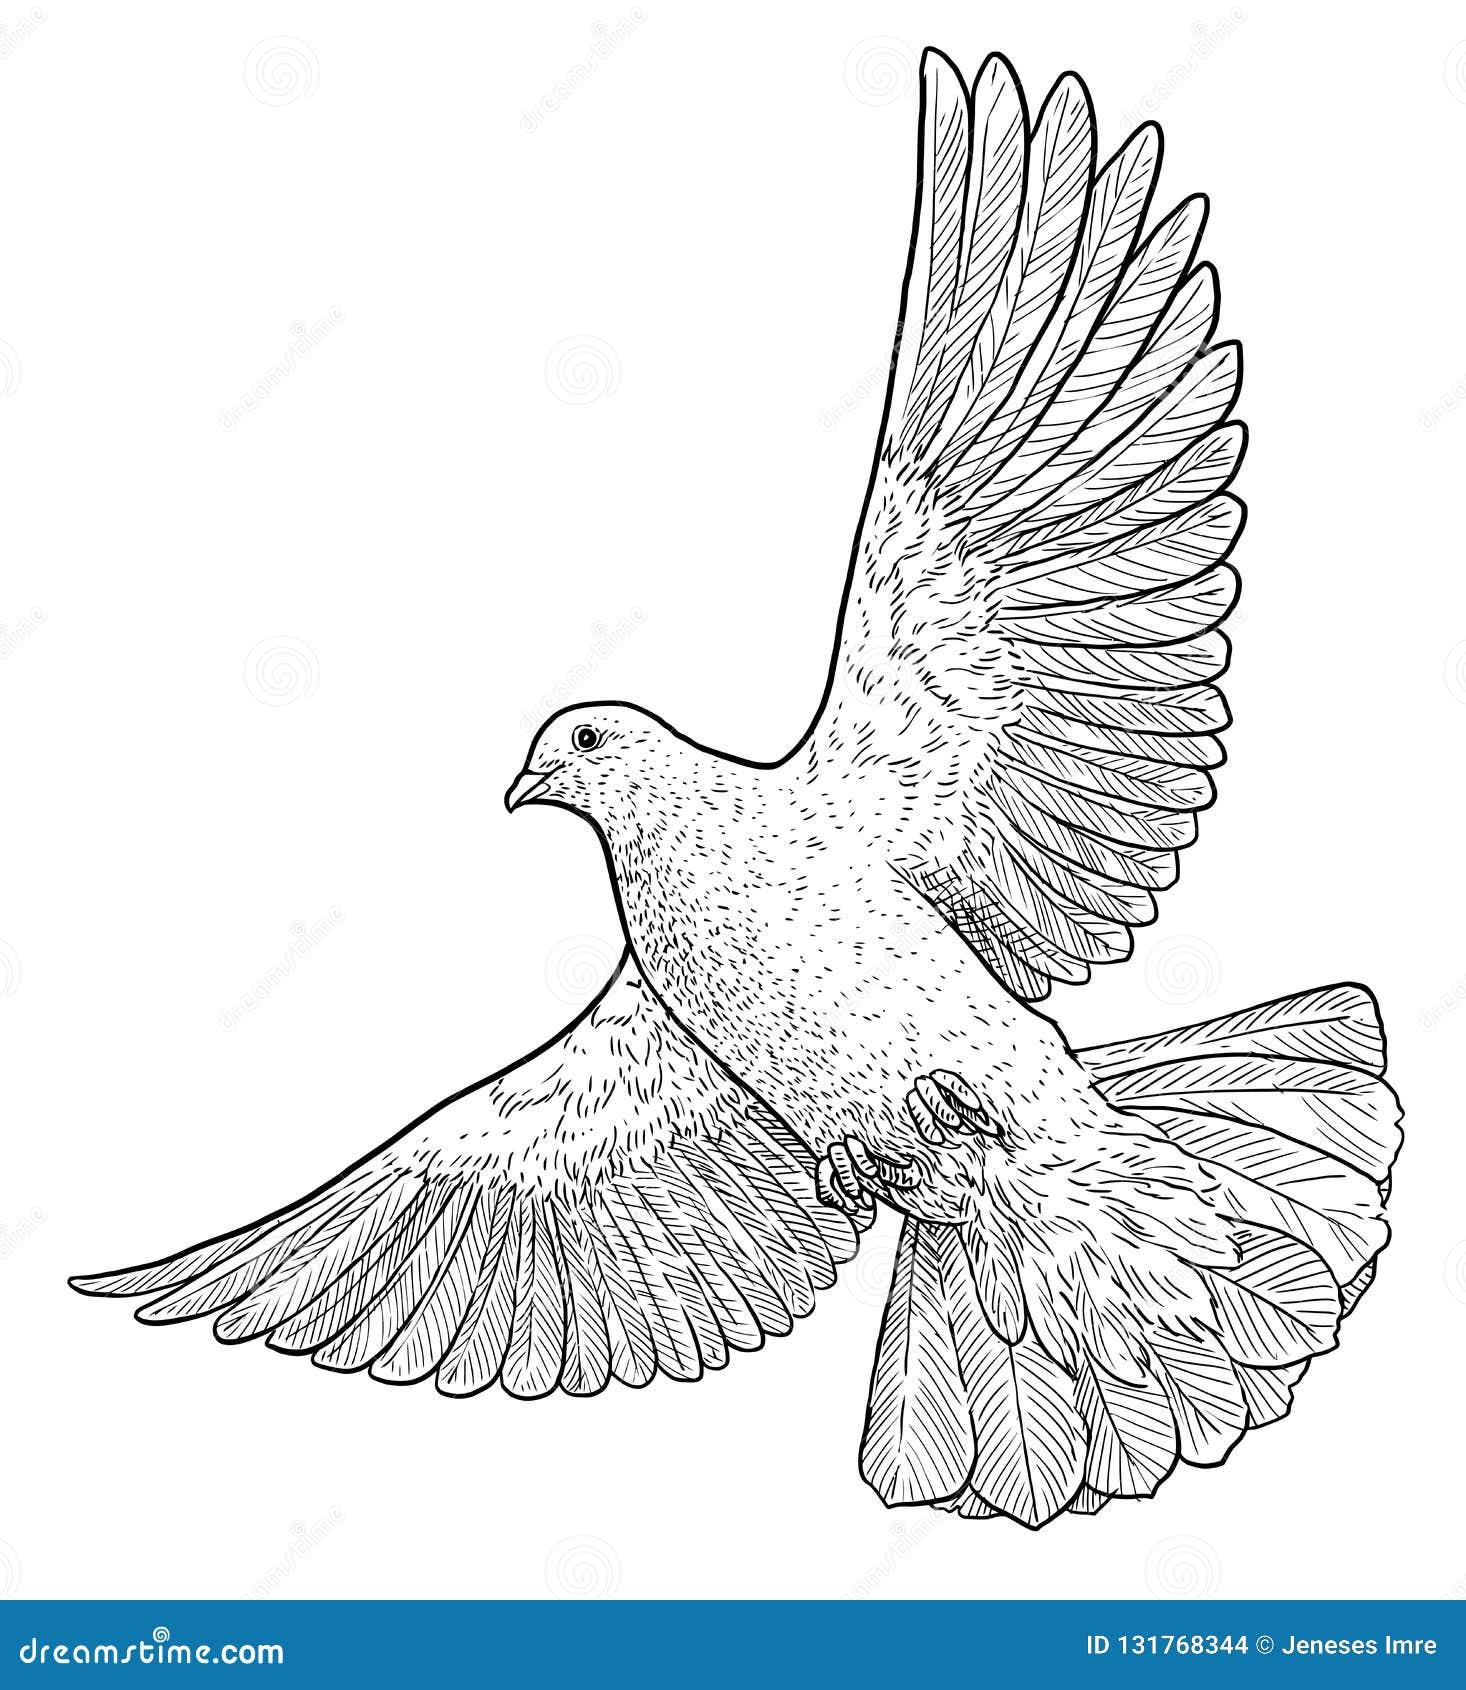 Flying Dove Illustration, Drawing, Engraving, Ink, Line Art